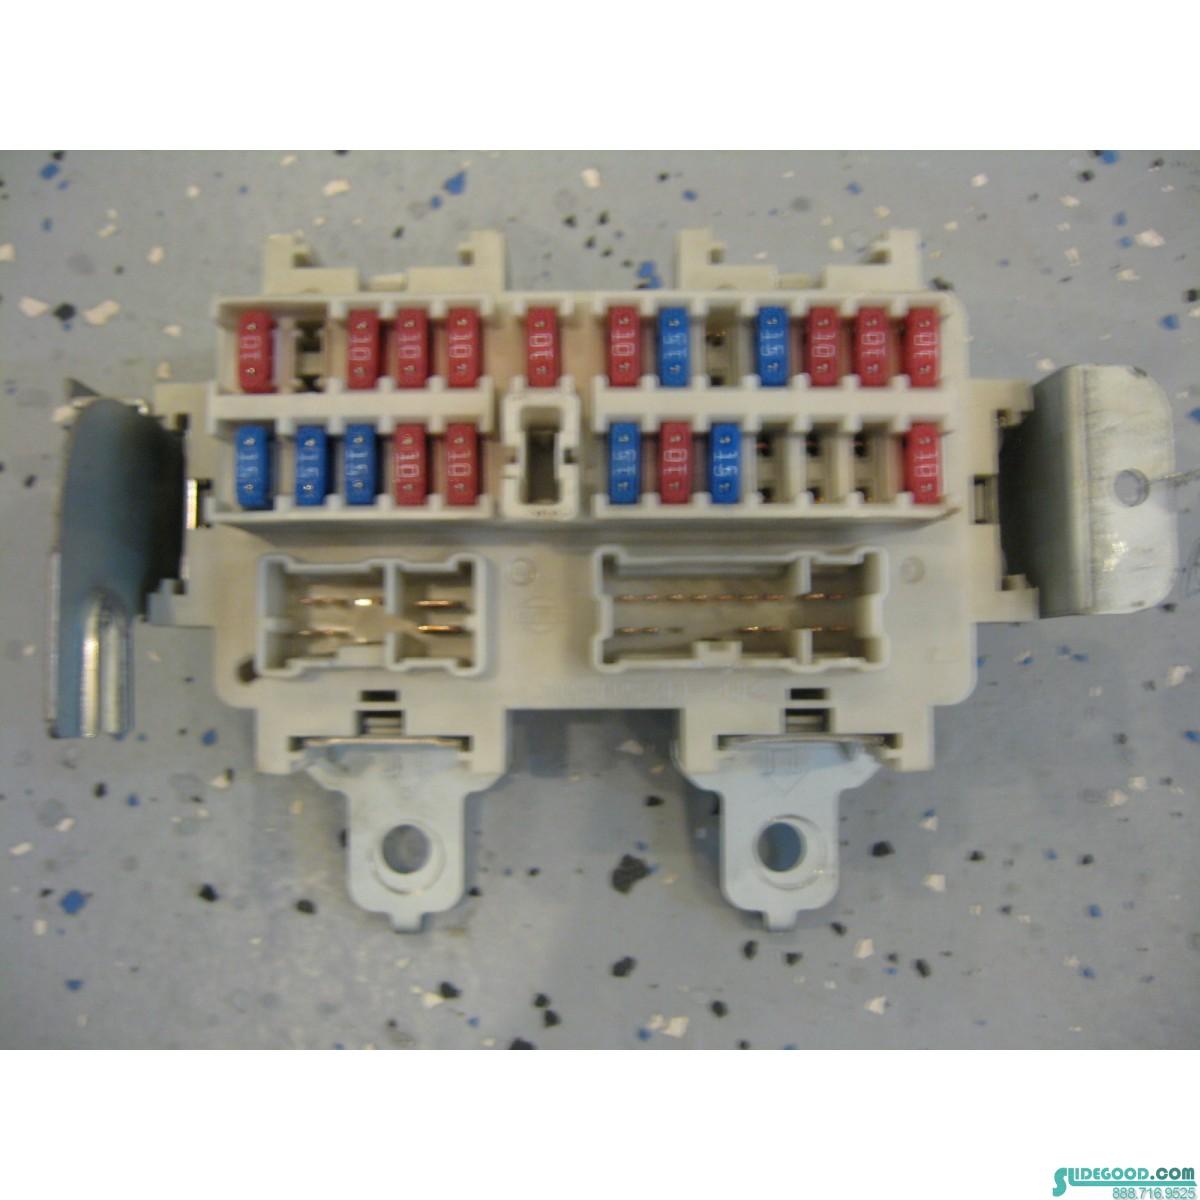 Fine 04 Nissan 350Z Interior Fuse Box Am600 Nice Interior Fuse Box Off A Wiring Cloud Cranvenetmohammedshrineorg